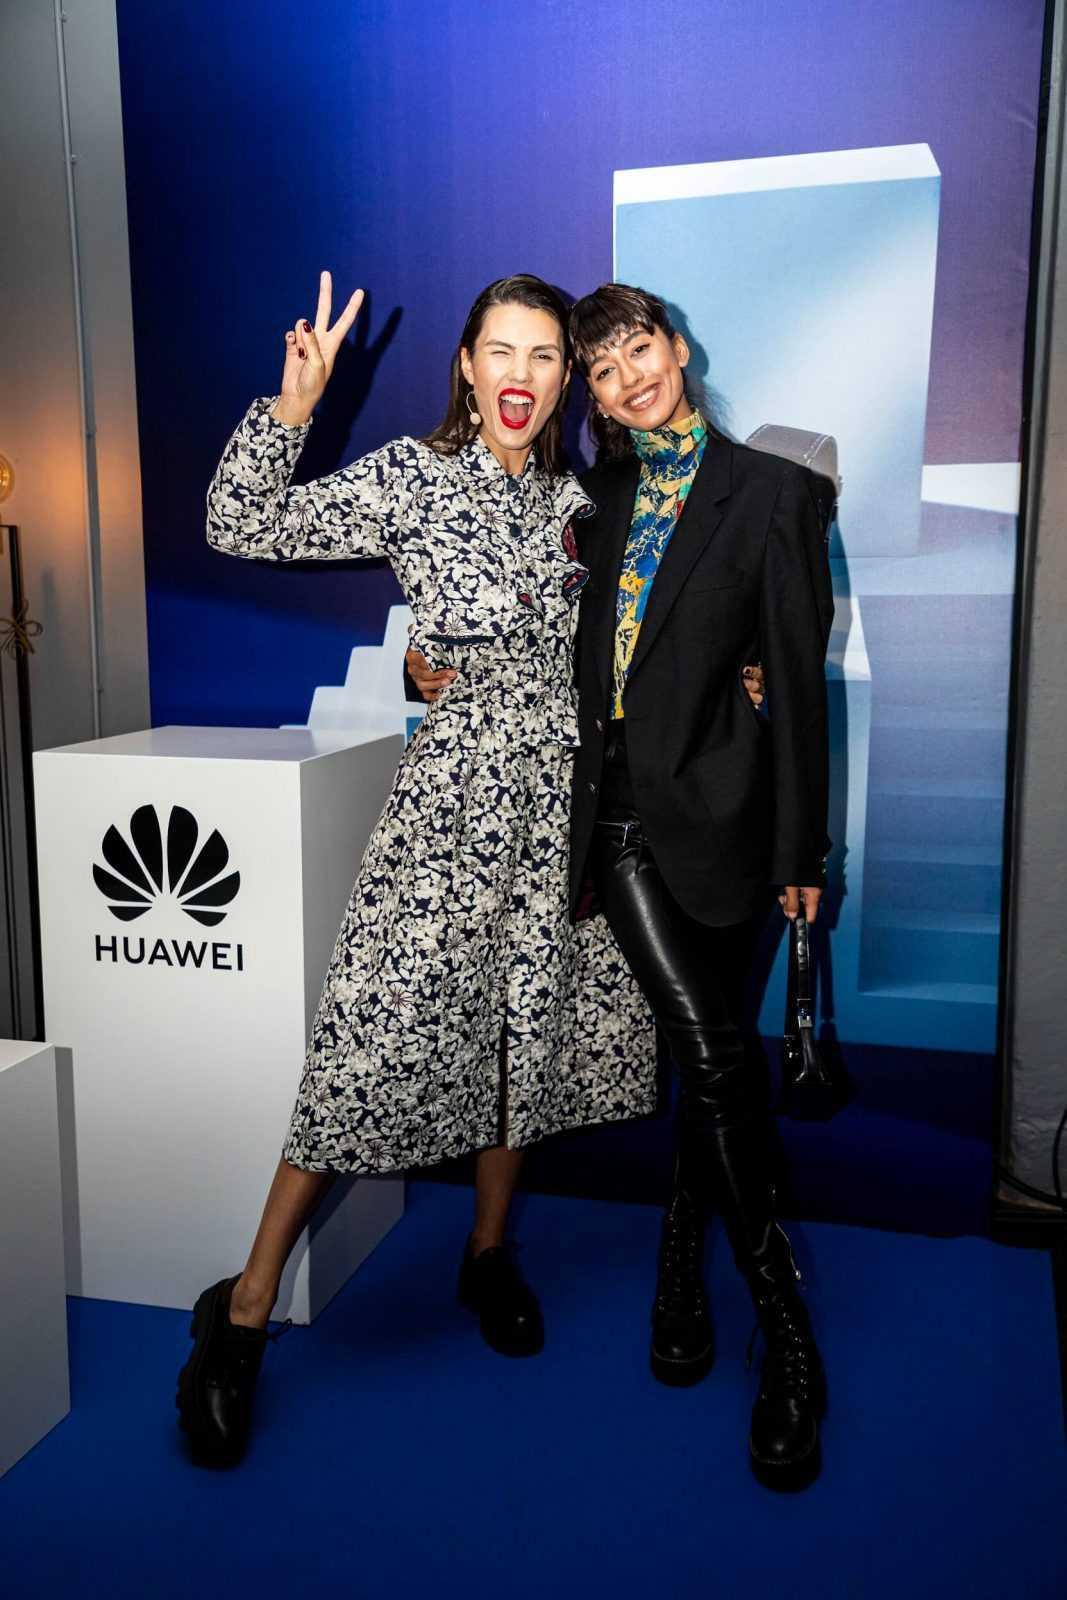 Huawei prezentacija un modes skate 7 (1)